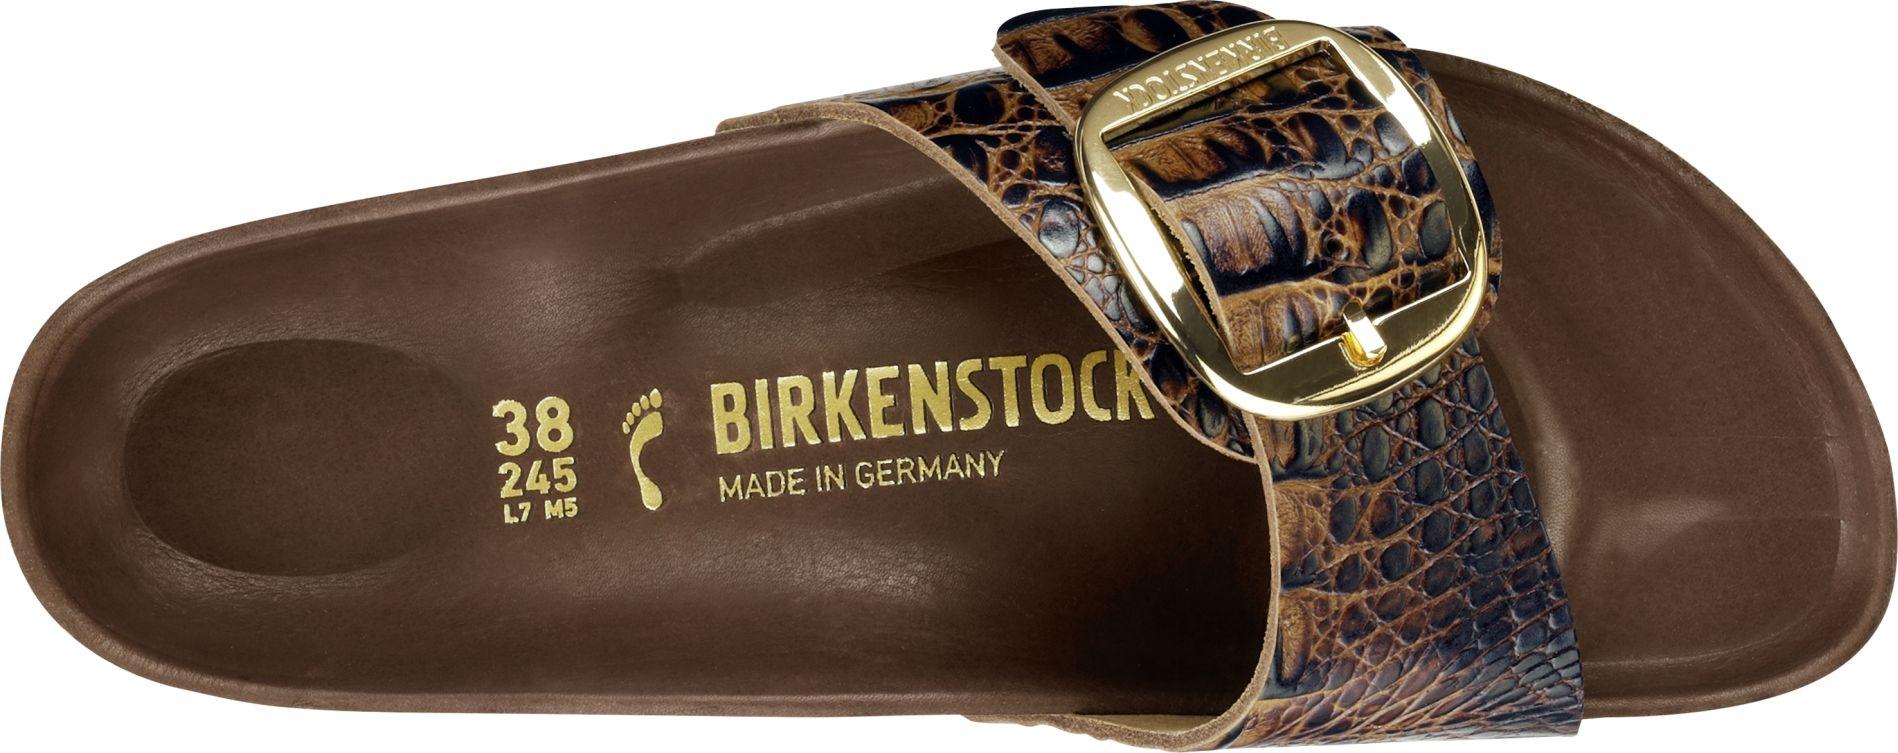 b69f771cfd2 ... Preview  Birkenstock Madrid Big Buckle Gator Brown